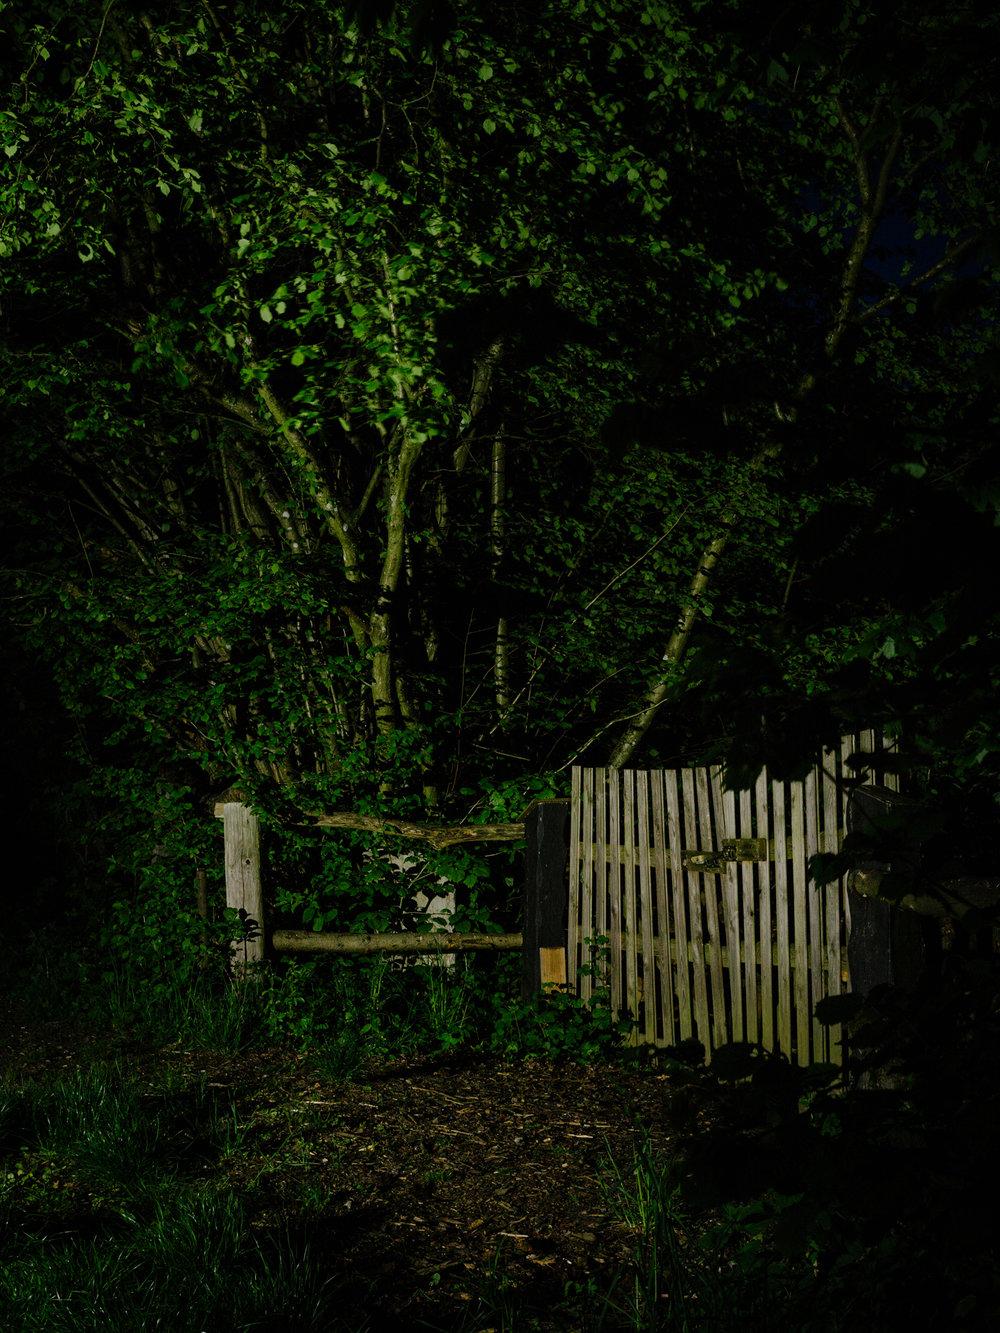 nachts-06.jpg